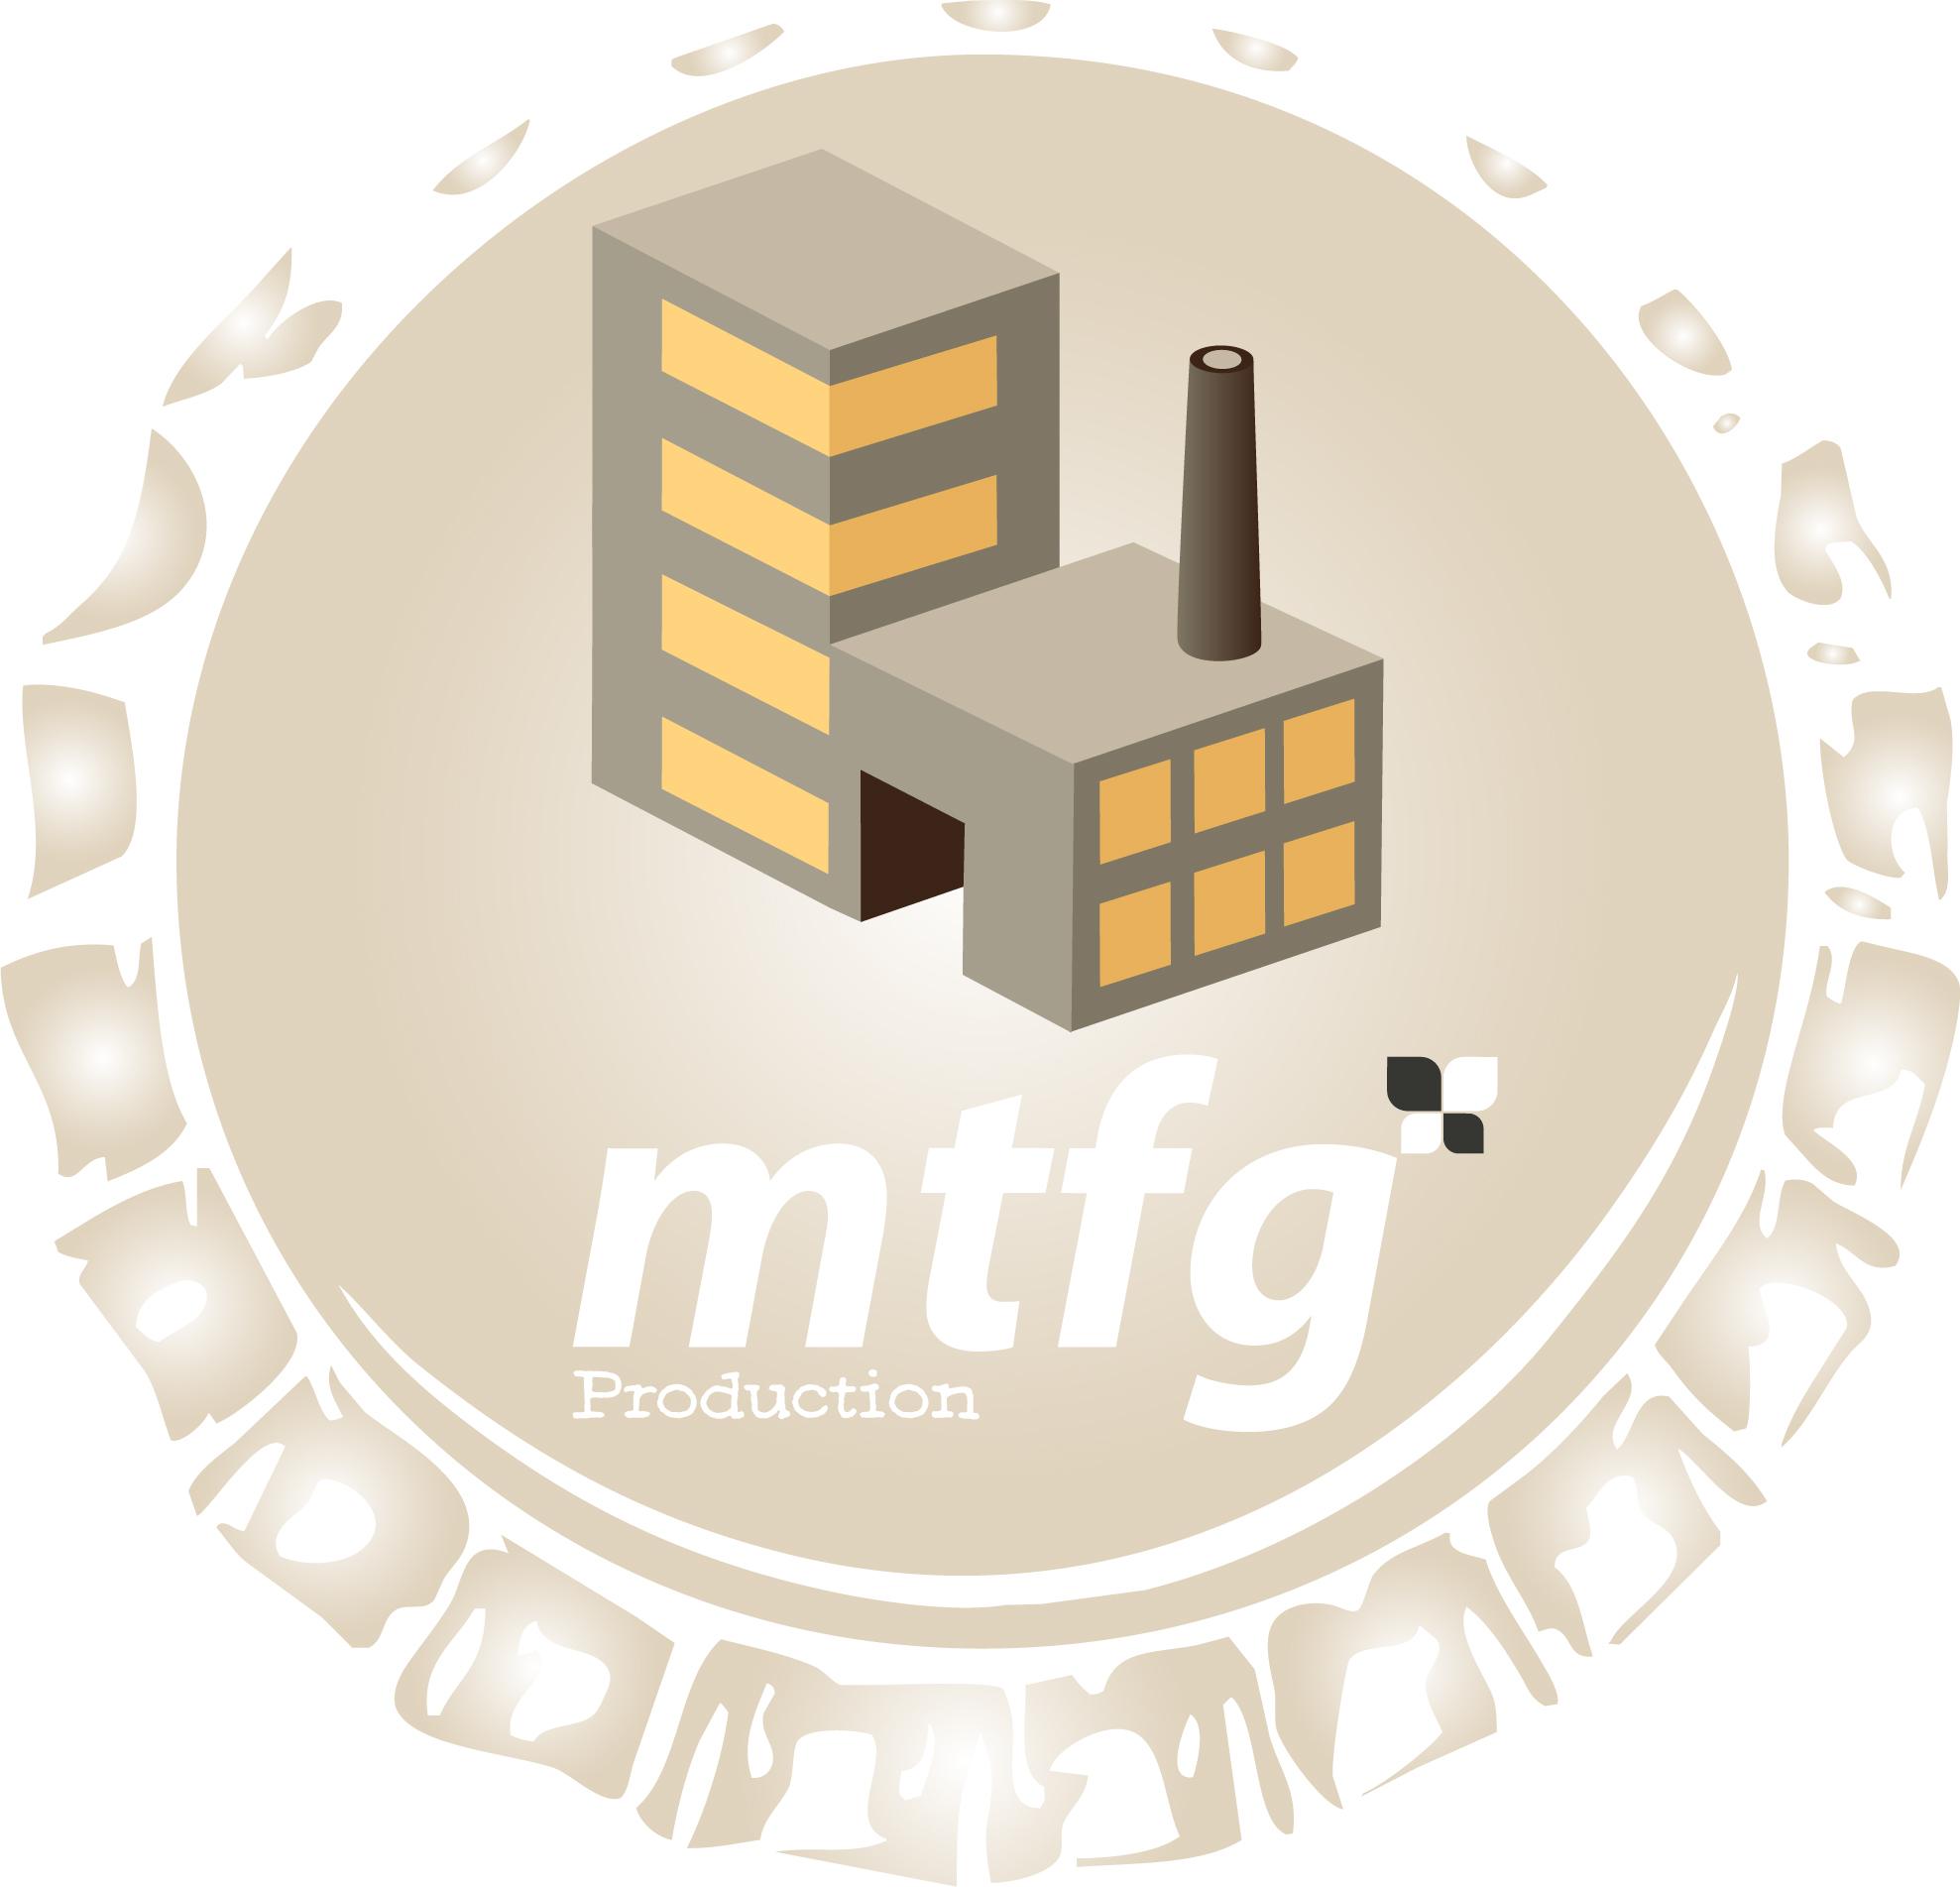 MTFG Production